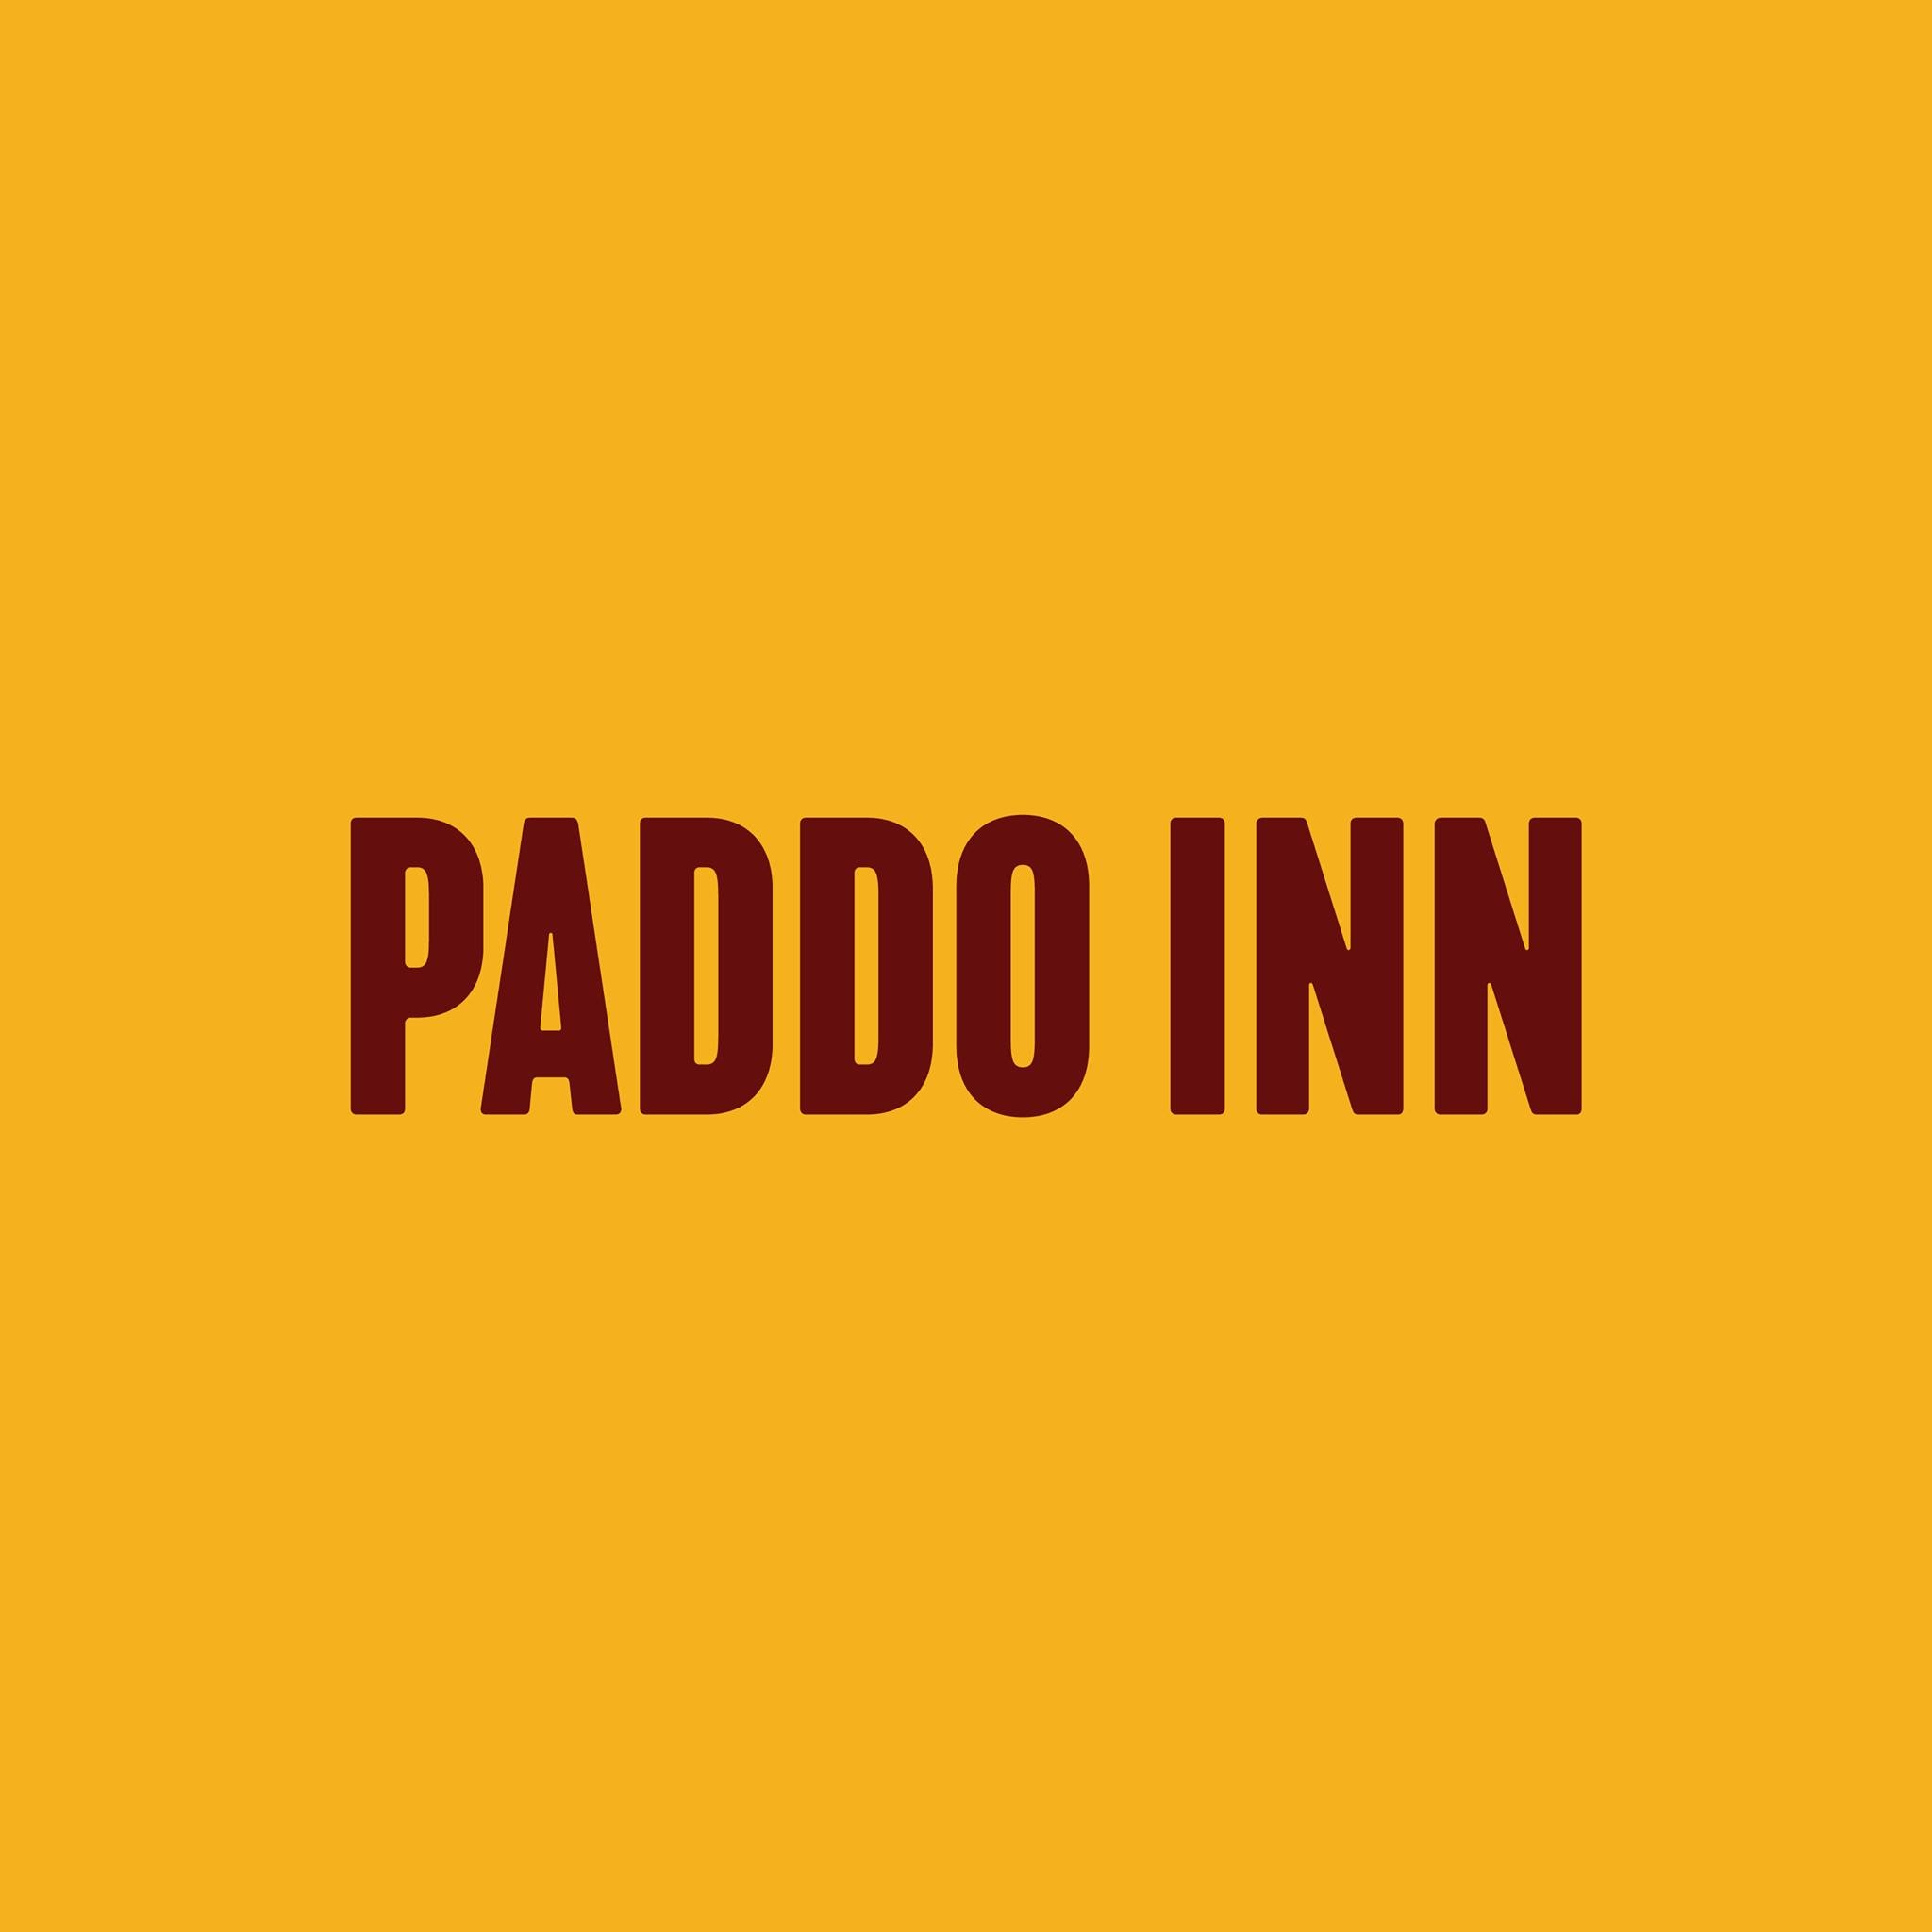 The Paddo Inn